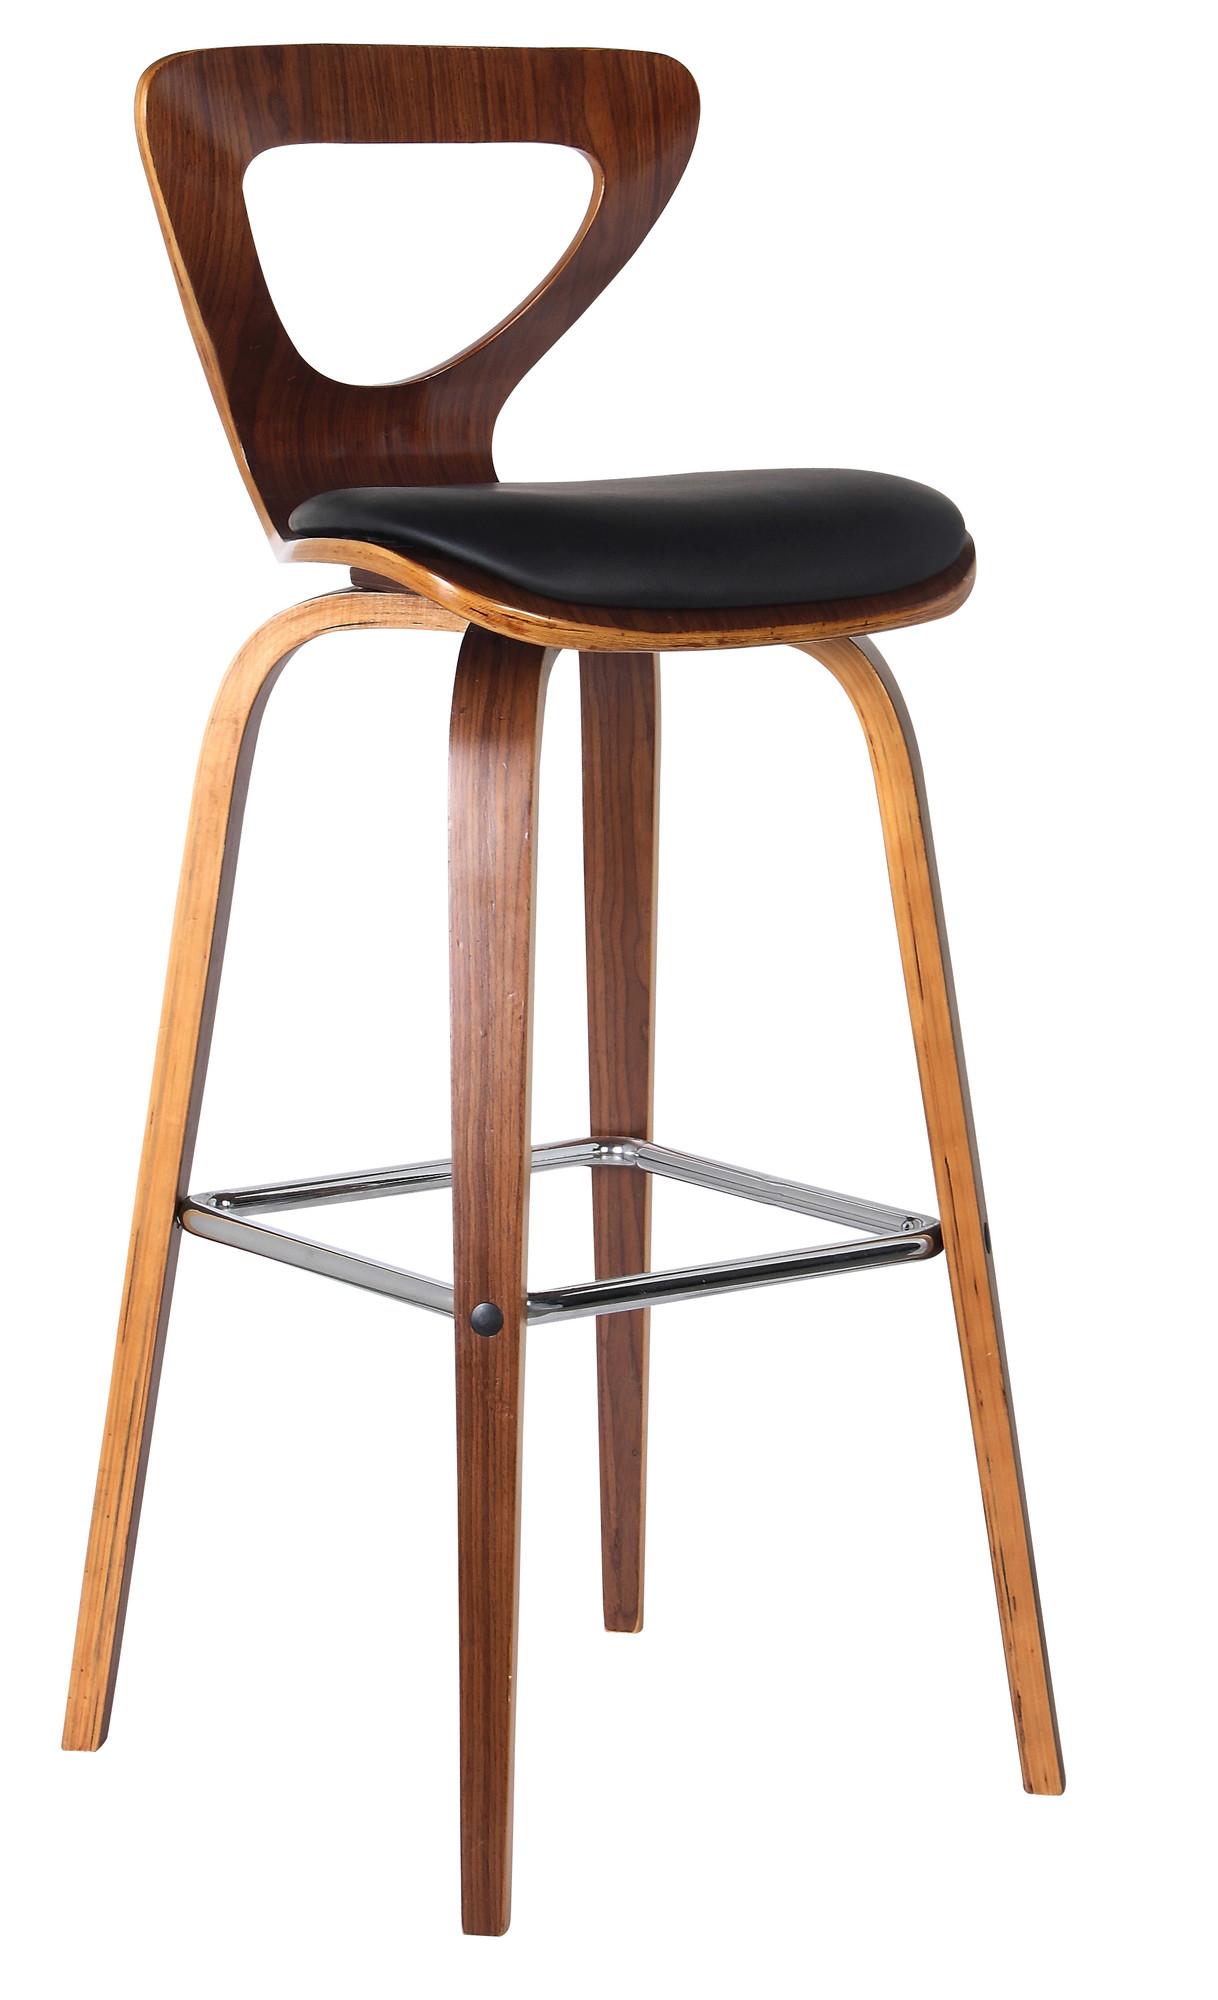 Stupendous 66Cm Oval Eye Faux Leather Barstool Download Free Architecture Designs Rallybritishbridgeorg